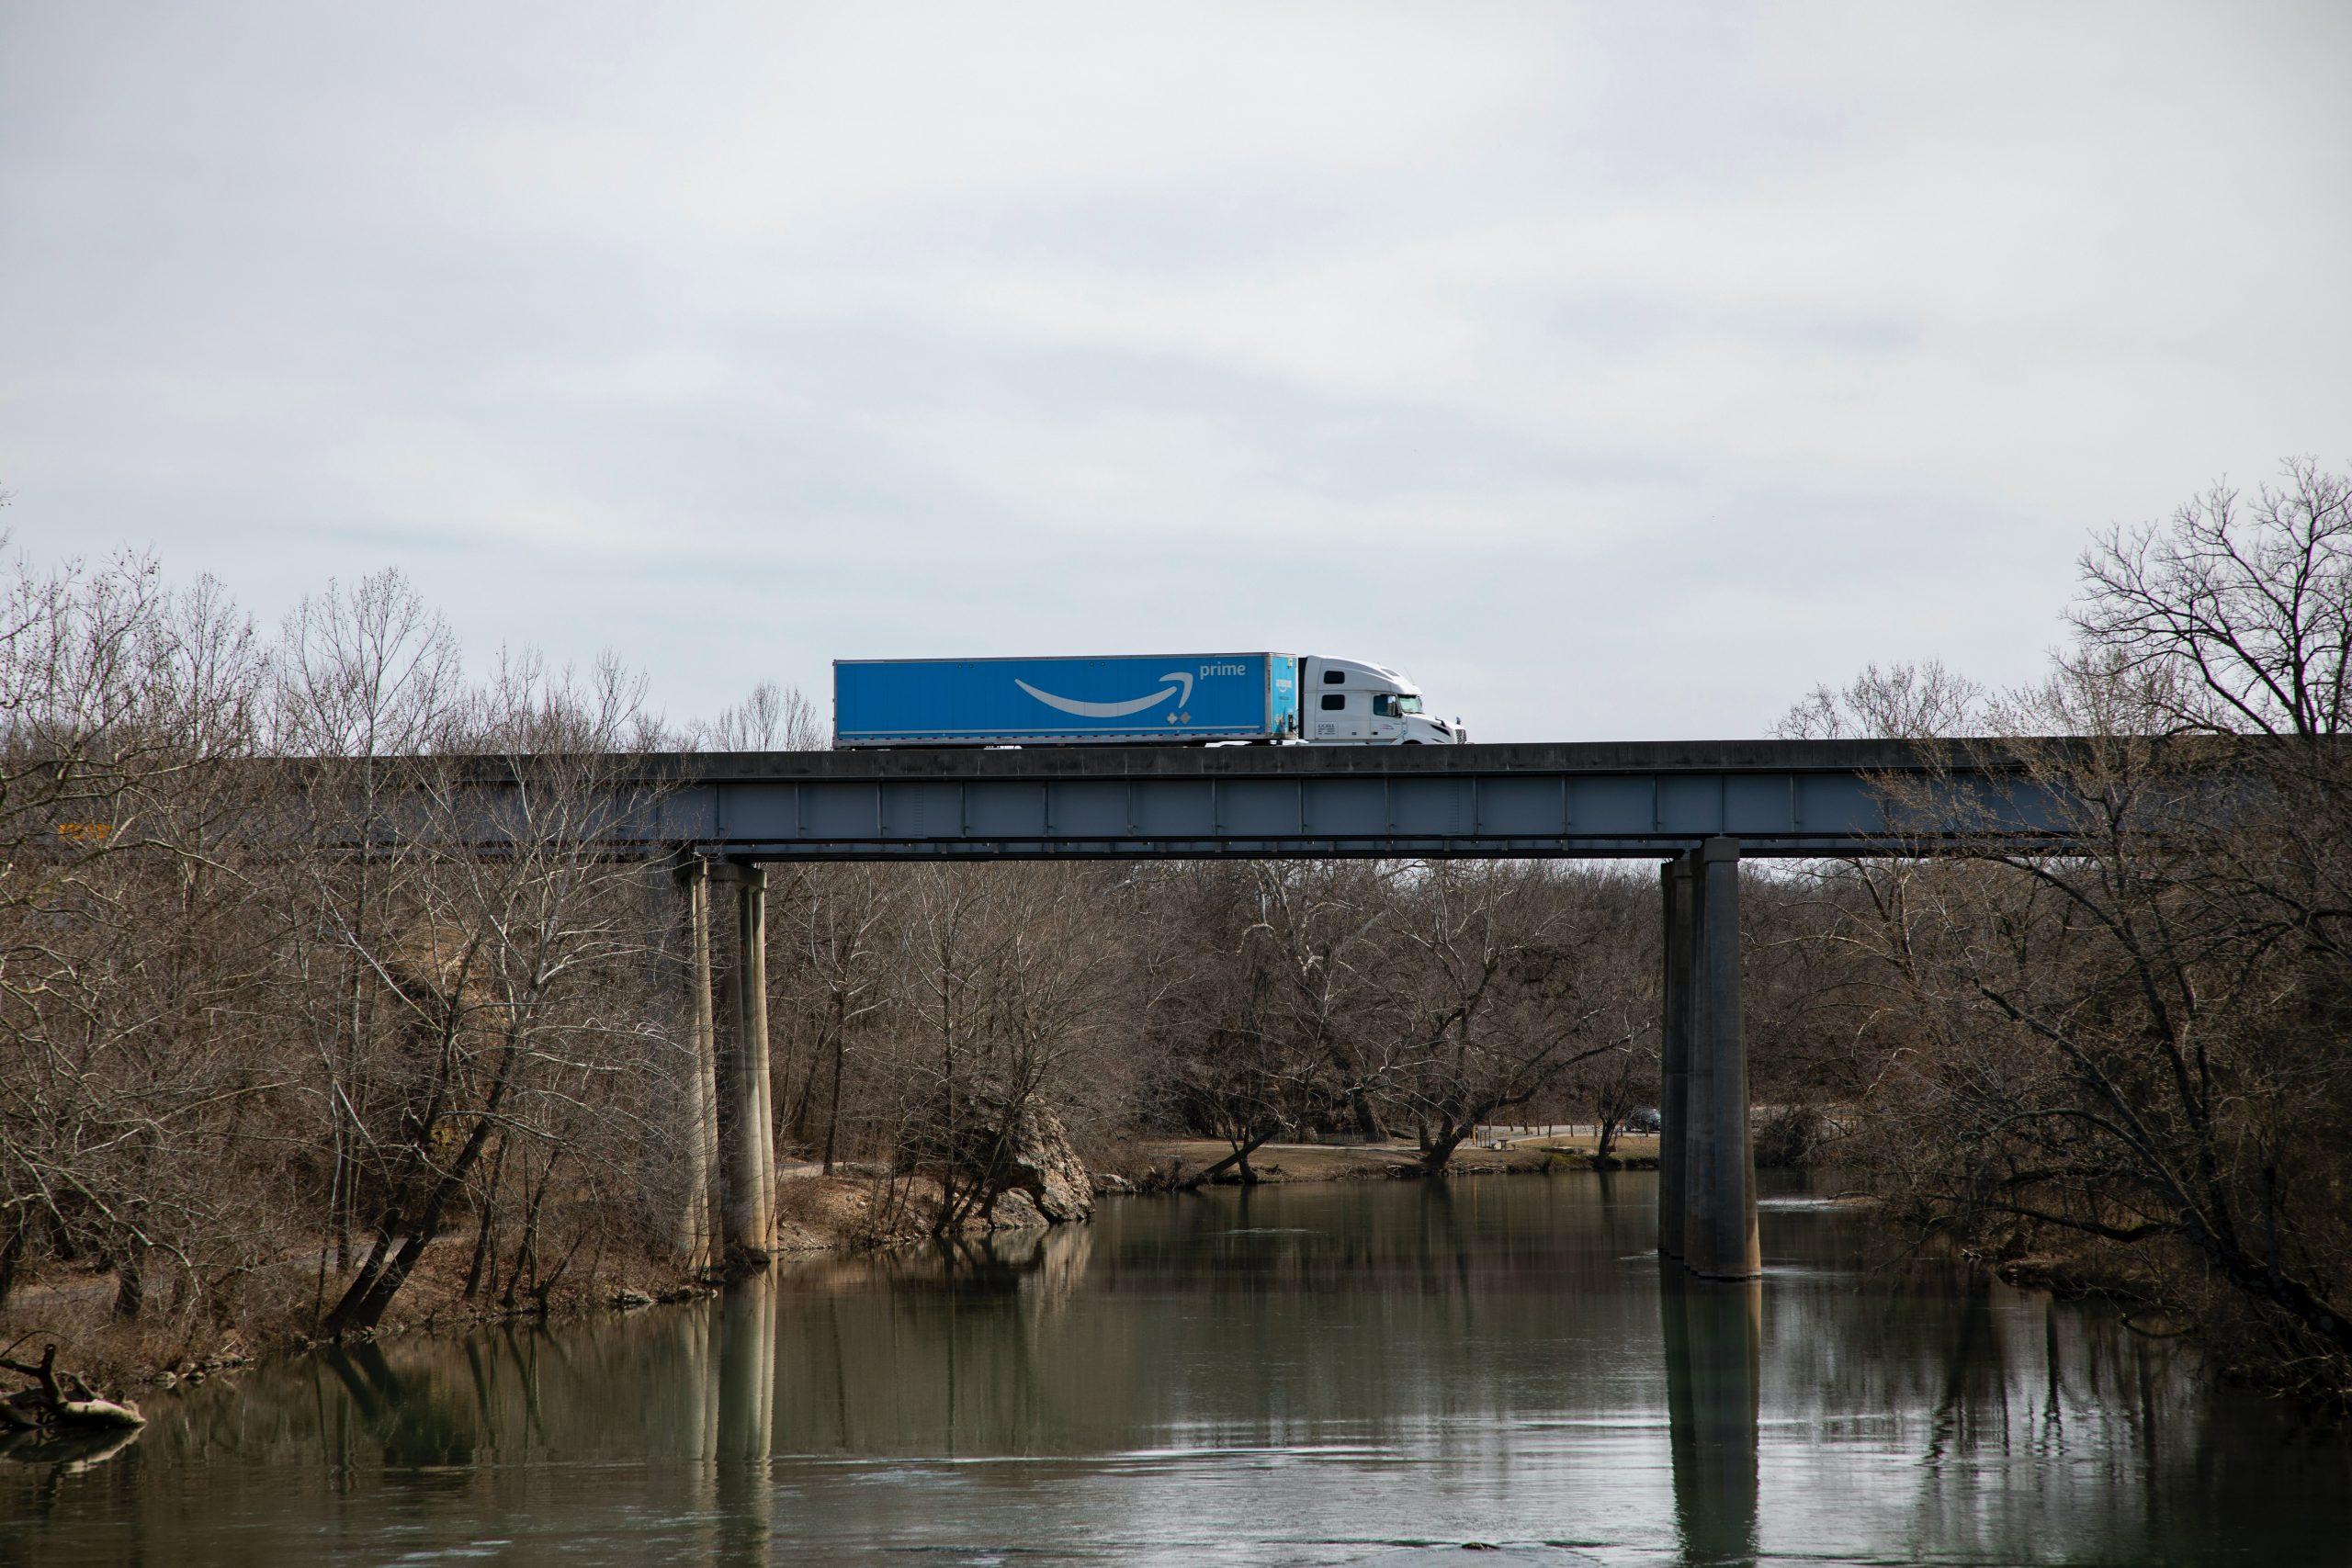 Amazon Prime truck. Photo by David Ballew on Unsplash